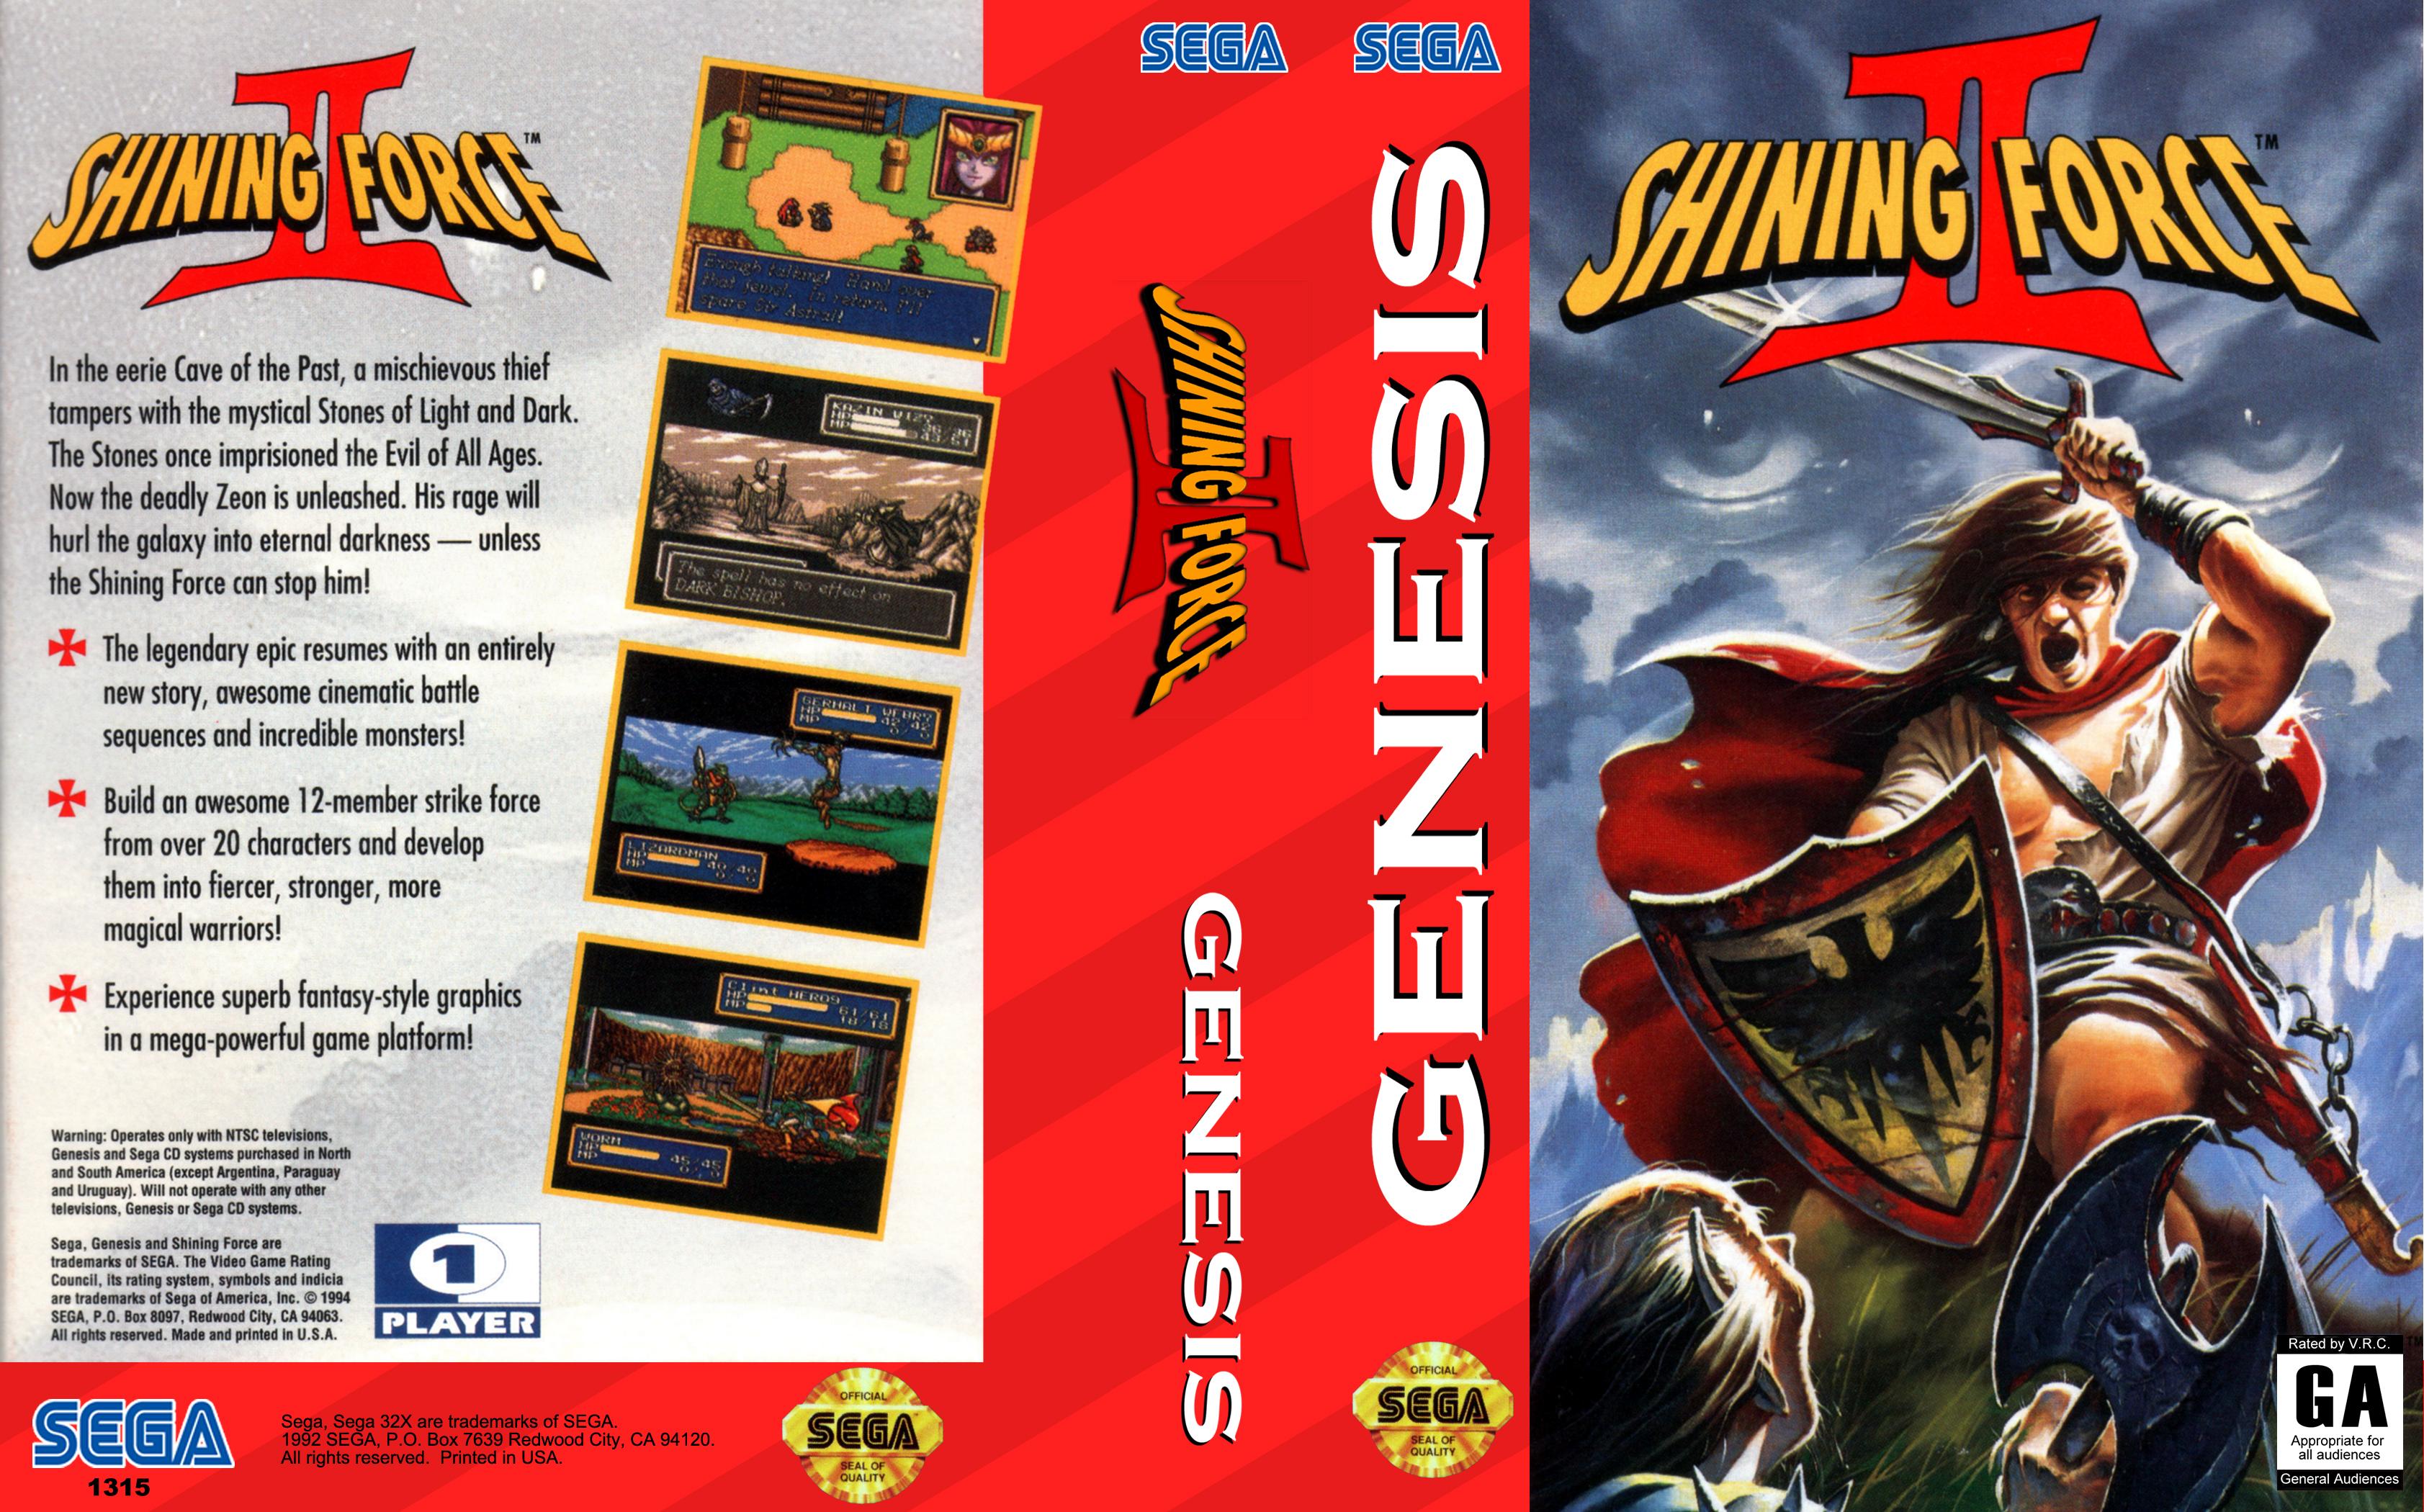 Shining Force II ROM Download for Sega Genesis - Rom Hustler